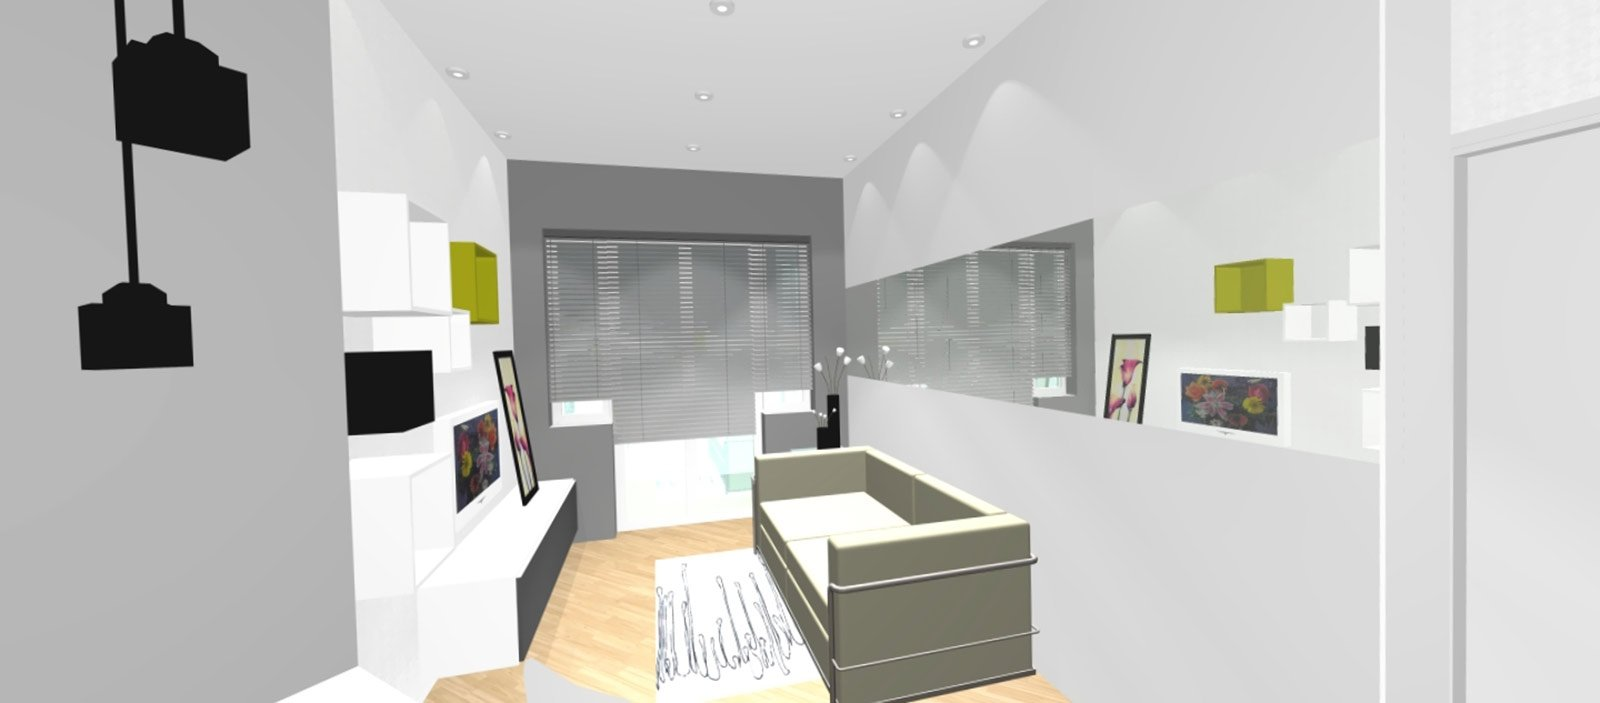 parete quinta in casa : Bilocale con cucina a vista - Cose di Casa